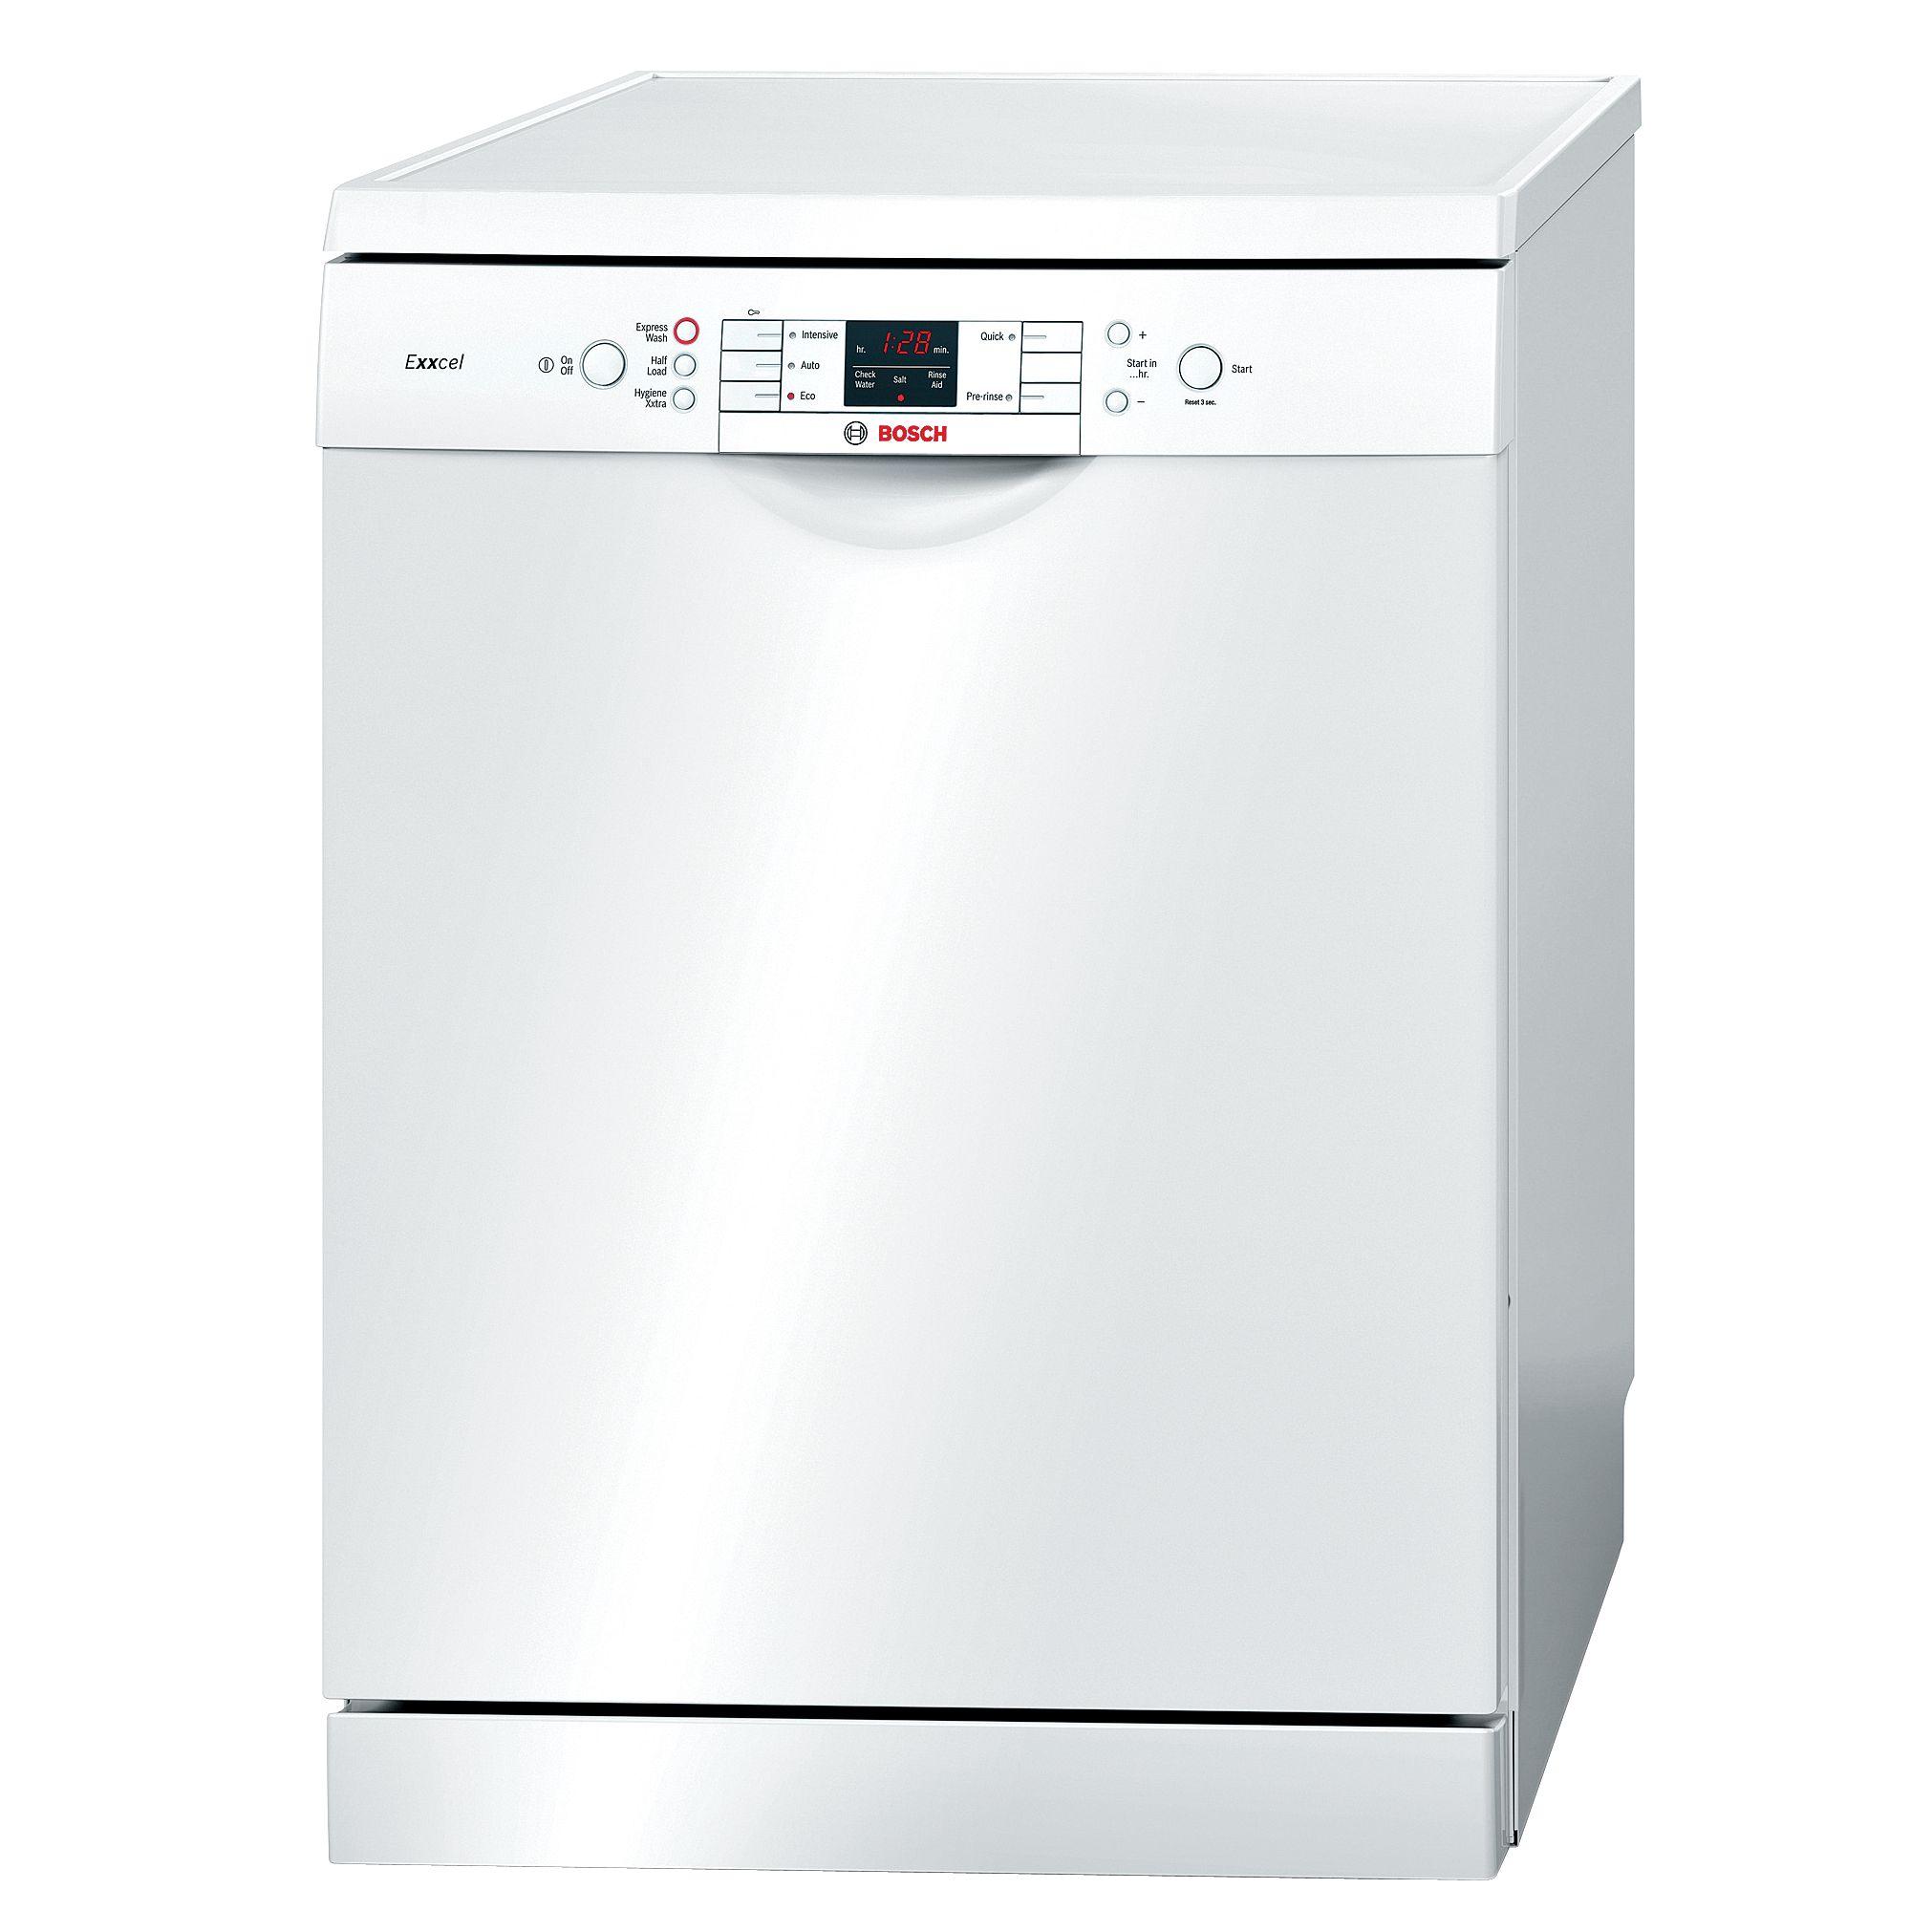 Bosch SMS53E12GB Dishwasher, White at John Lewis